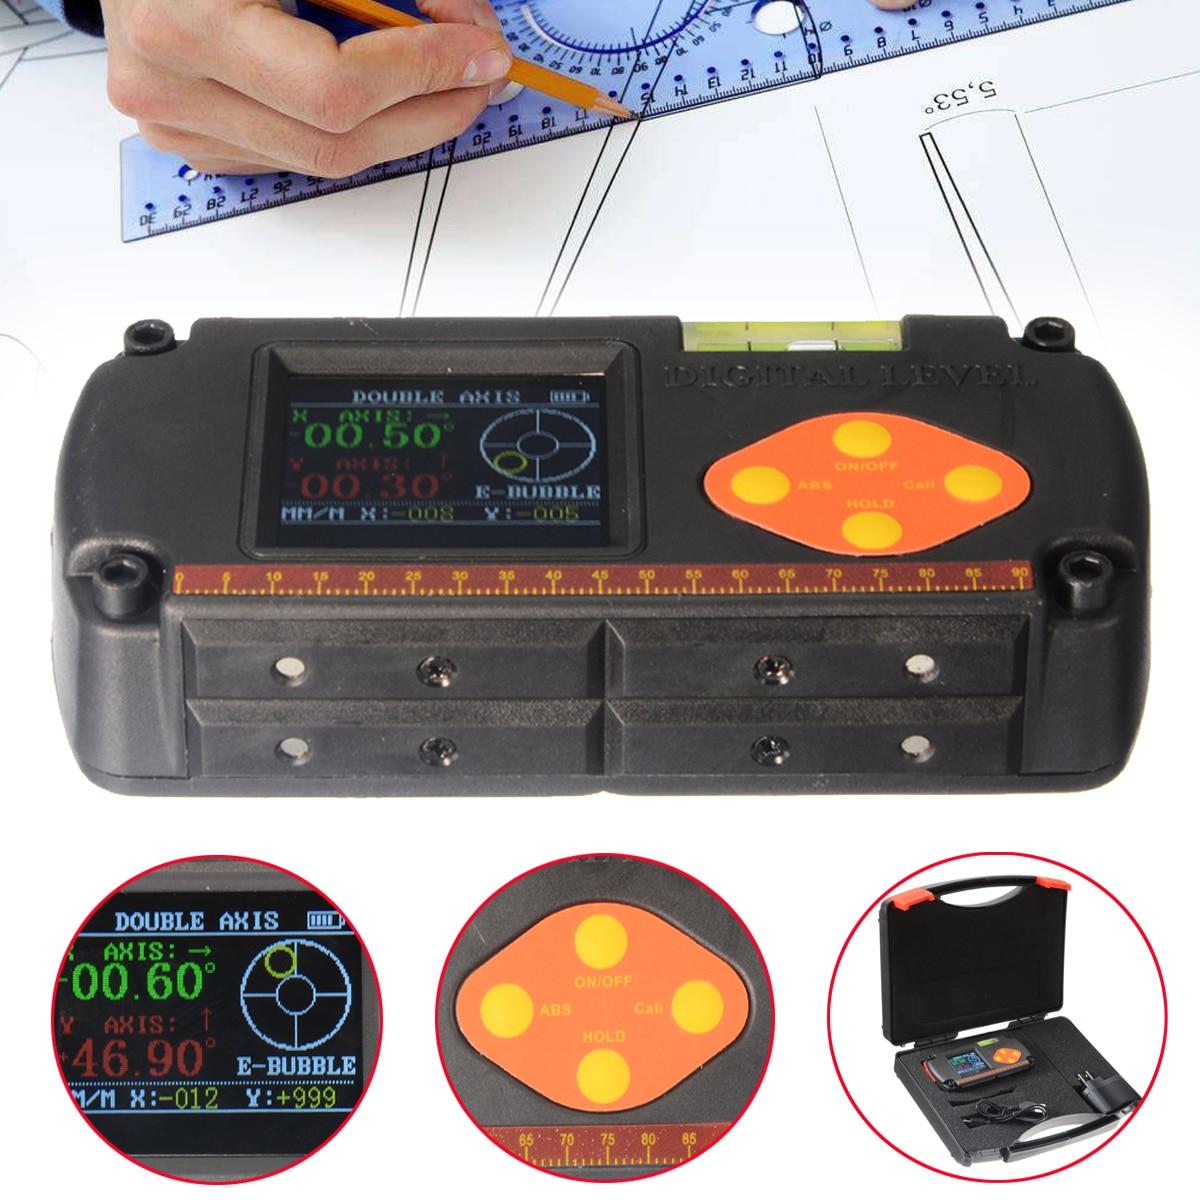 цена на Digital Protractor Inclinometer Dual Axis Level Measure Box Angle Finder Gauge Ruler Elevation Meter DAX Digital Level